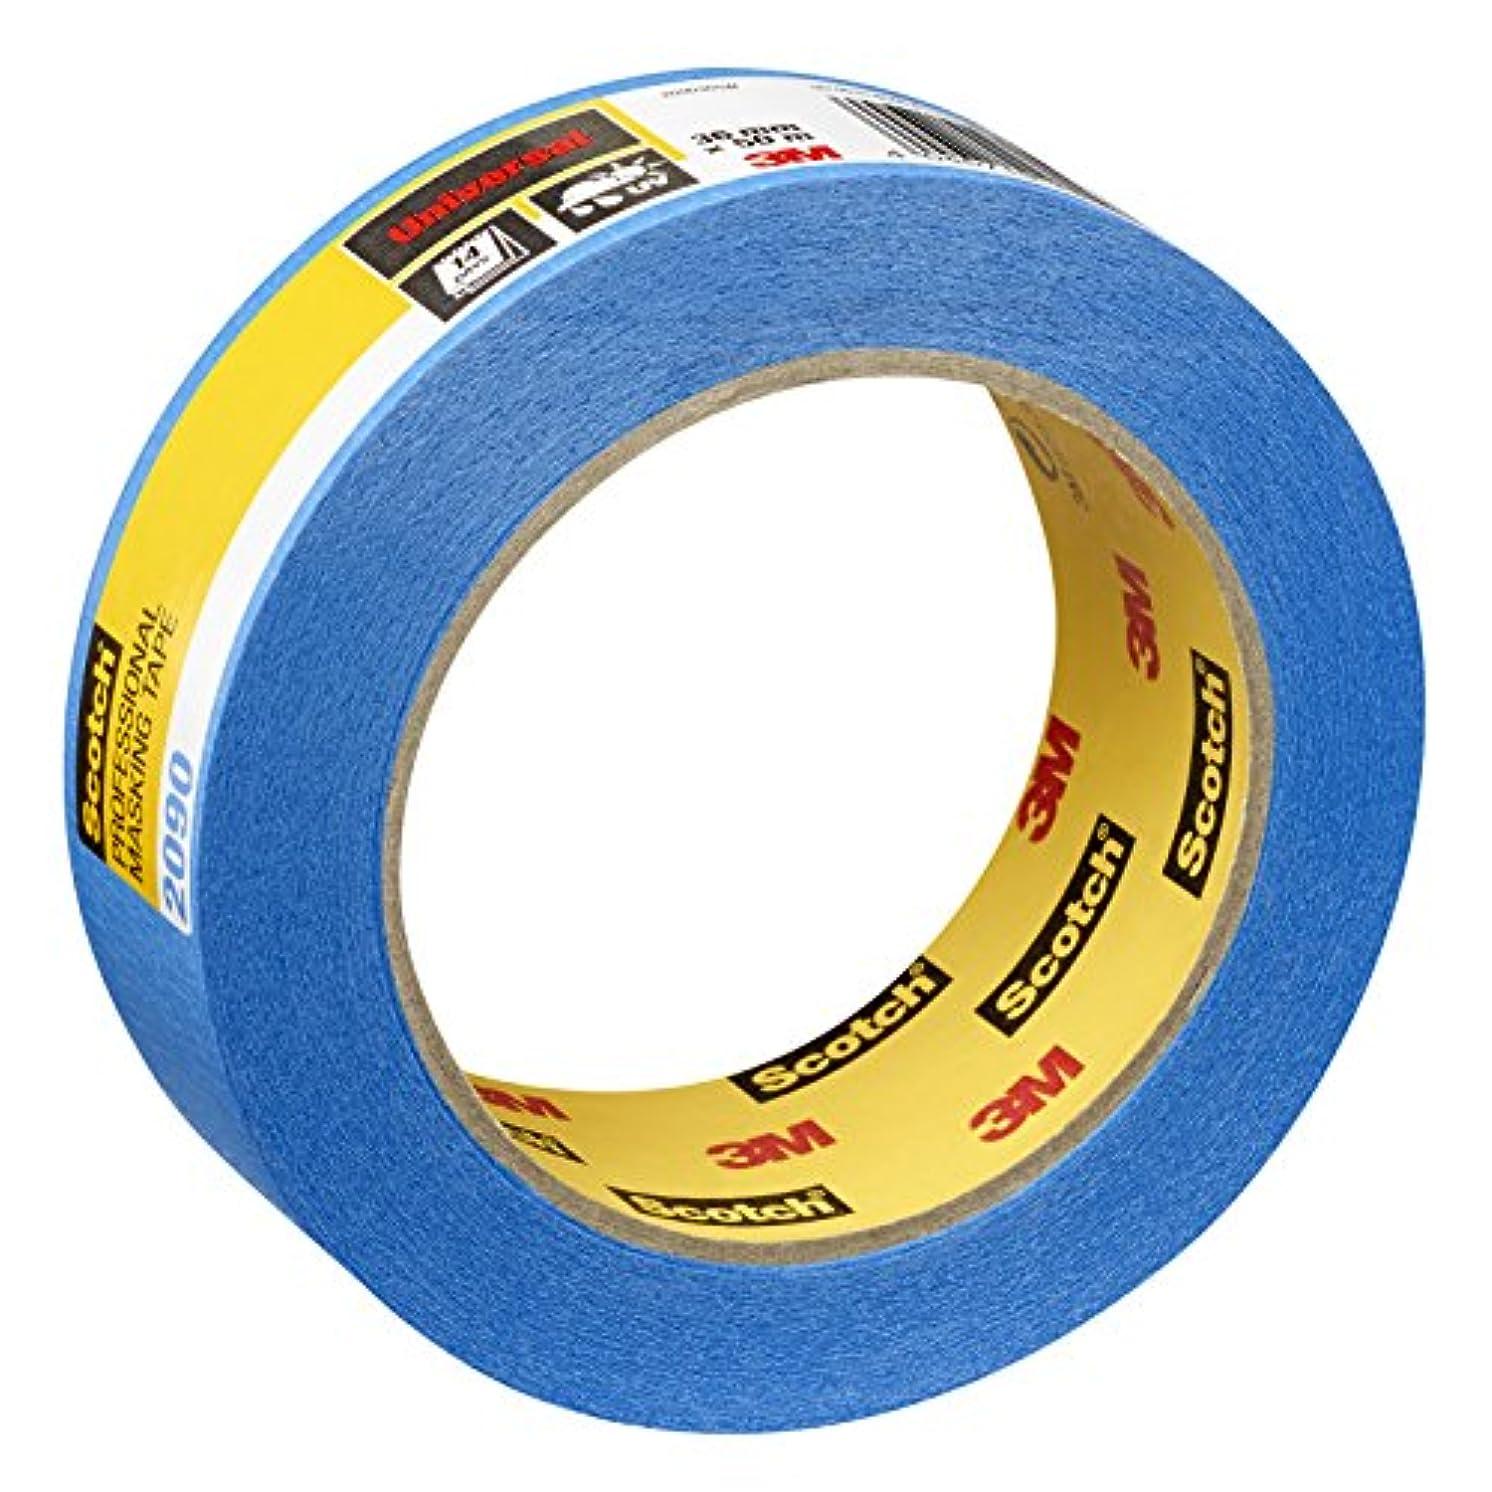 Scotch Painter's Masking Tape 36?mm x 50?m?–?Expert Plus Quality, Blue, PT209036